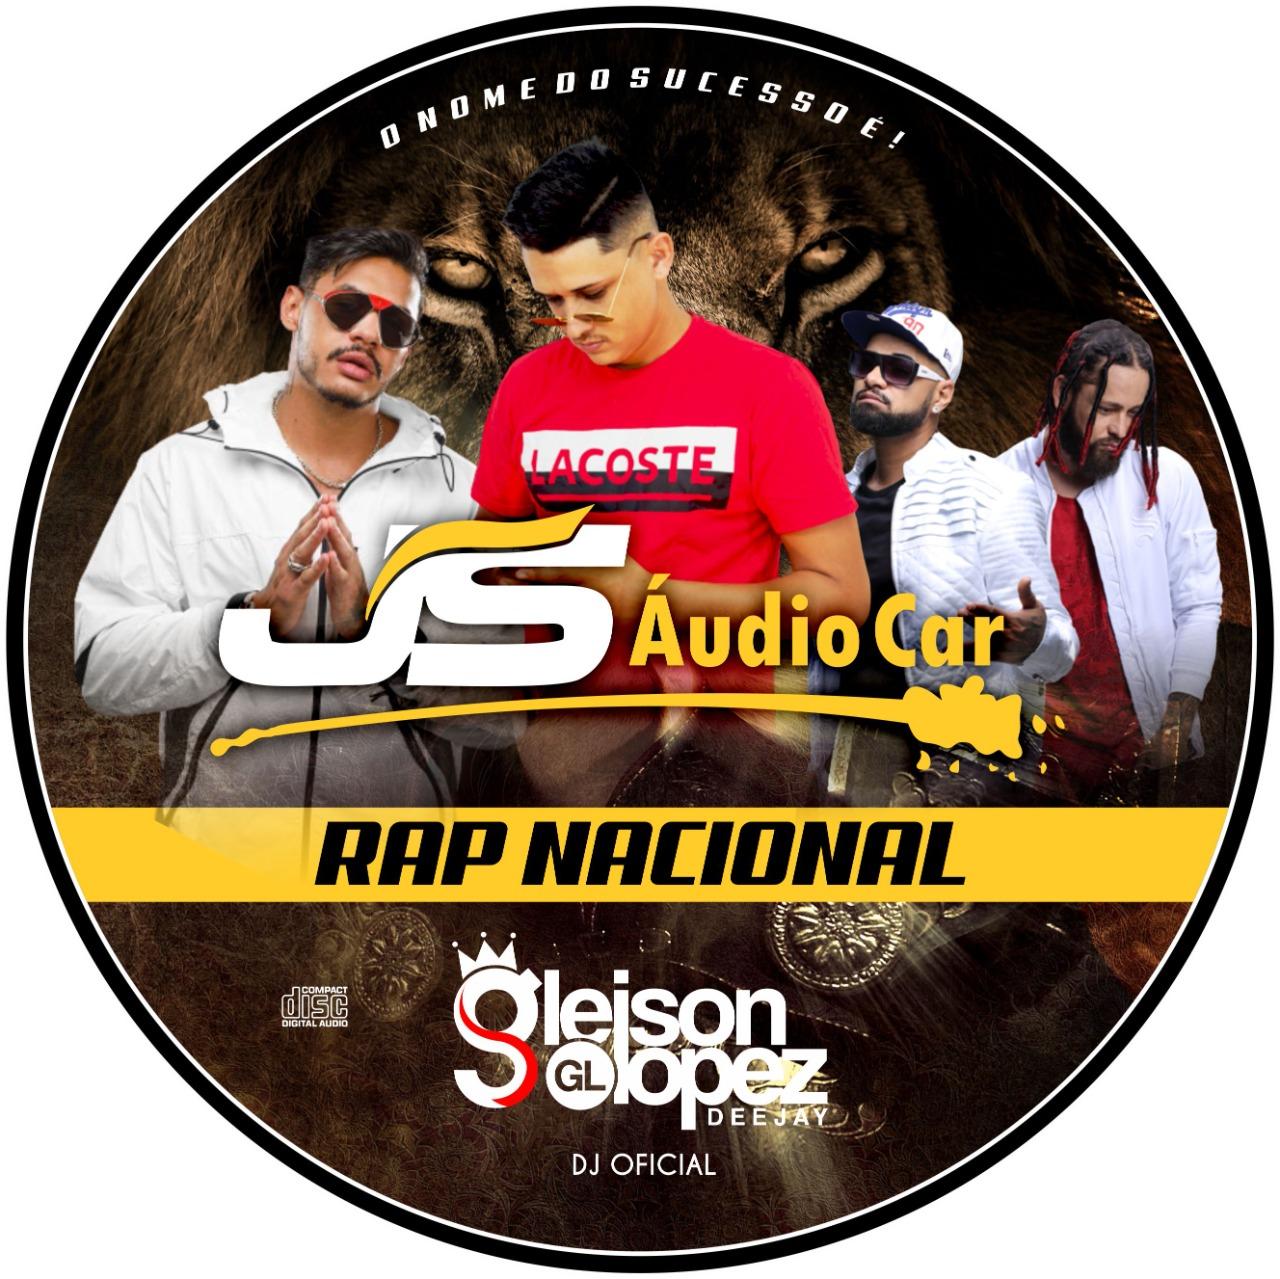 JS AUDIO CAR RAP NACIONAL 2K21 - Gleison Lopez